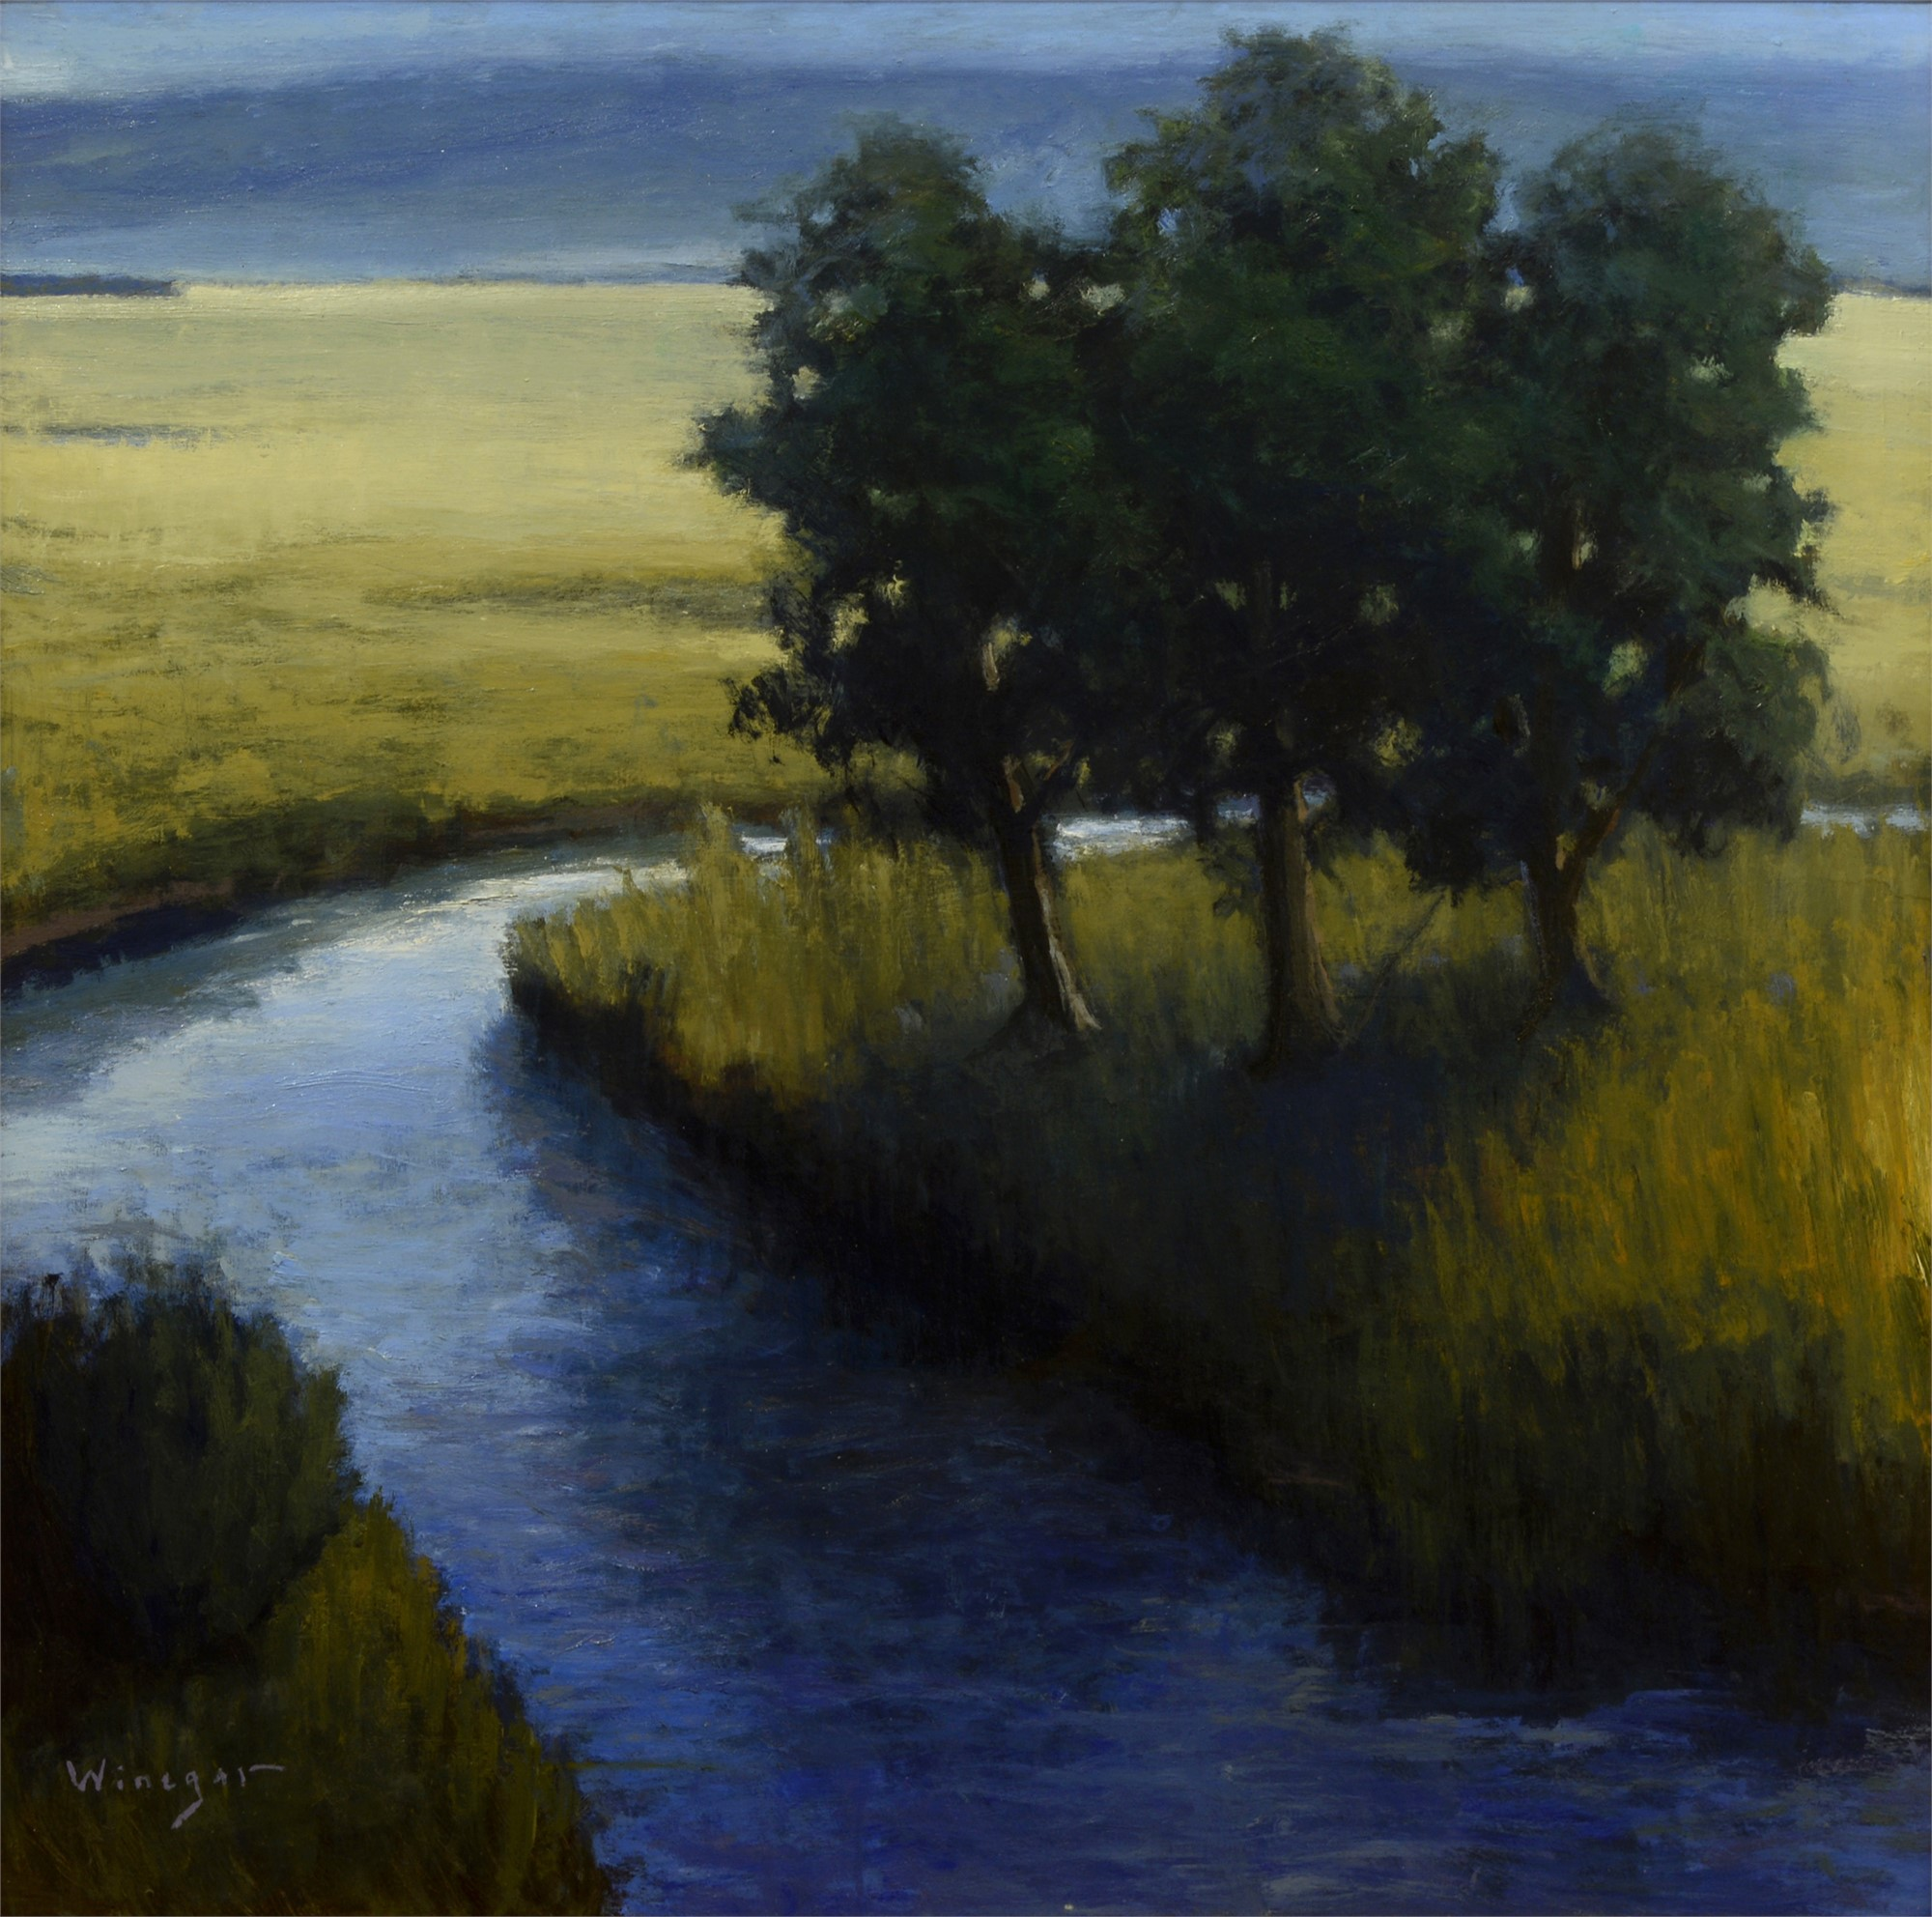 Three Trees by Seth Winegar